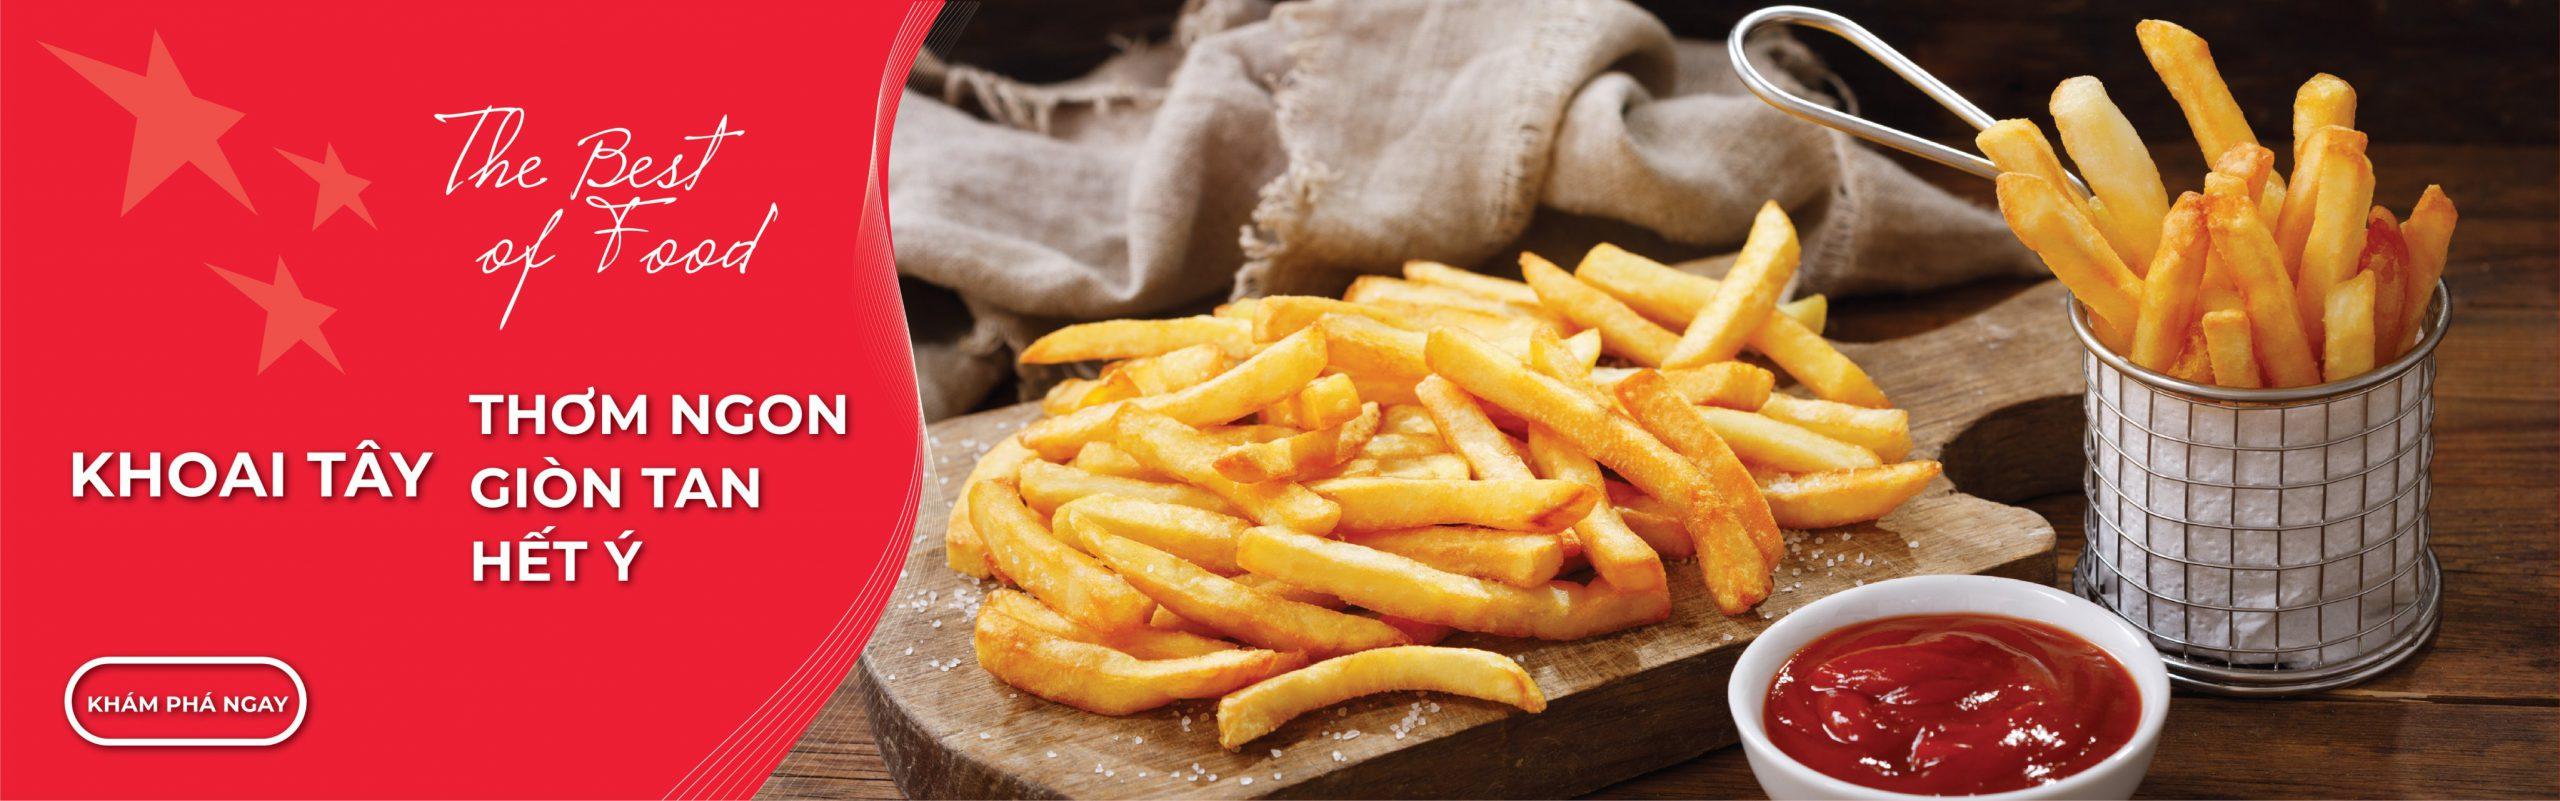 Banner khoai tây